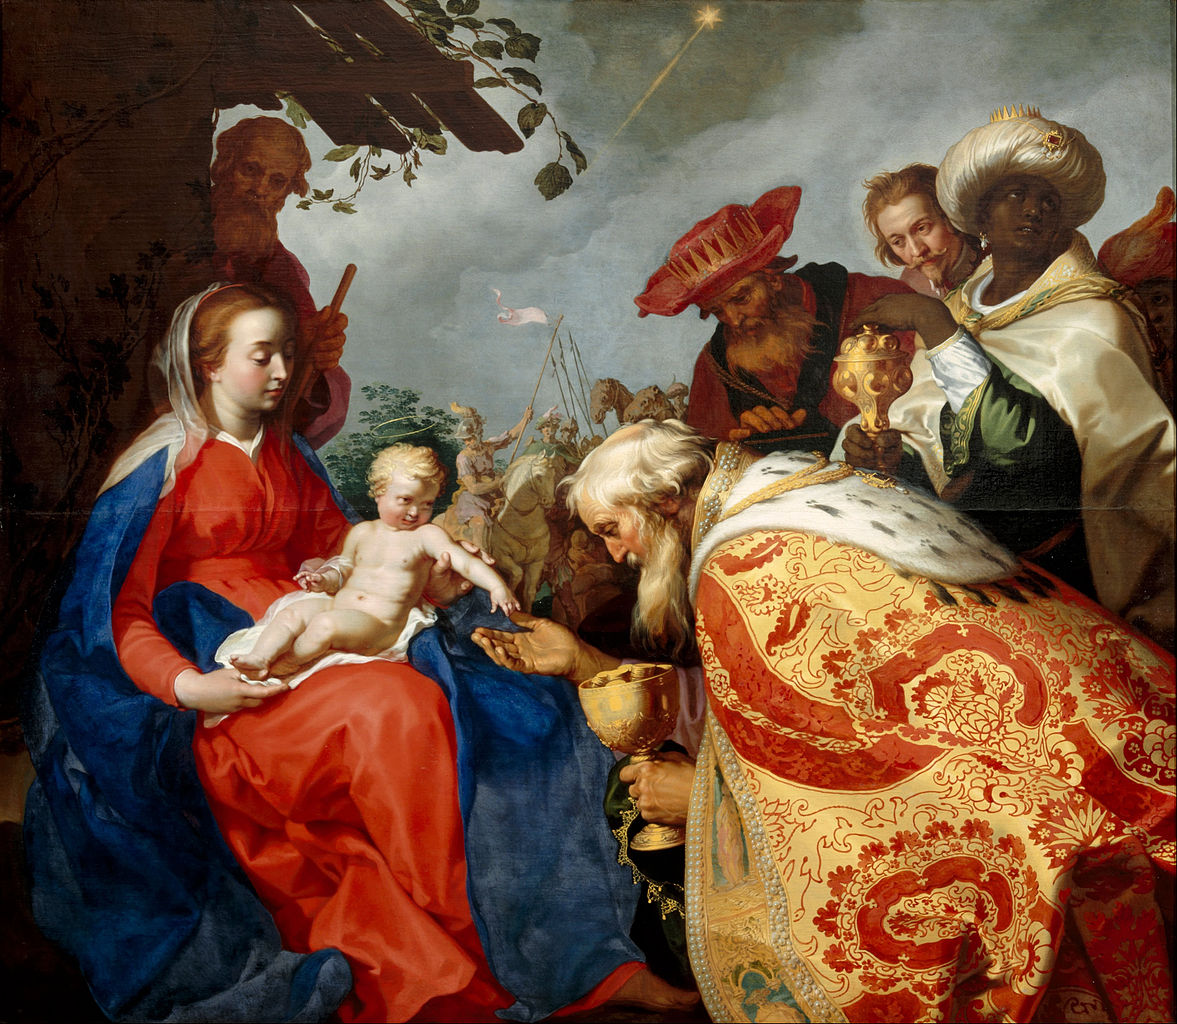 1177px-Abraham_Bloemaert_-_The_adoration_of_the_Magi_-_Google_Art_Project (1624.jpg